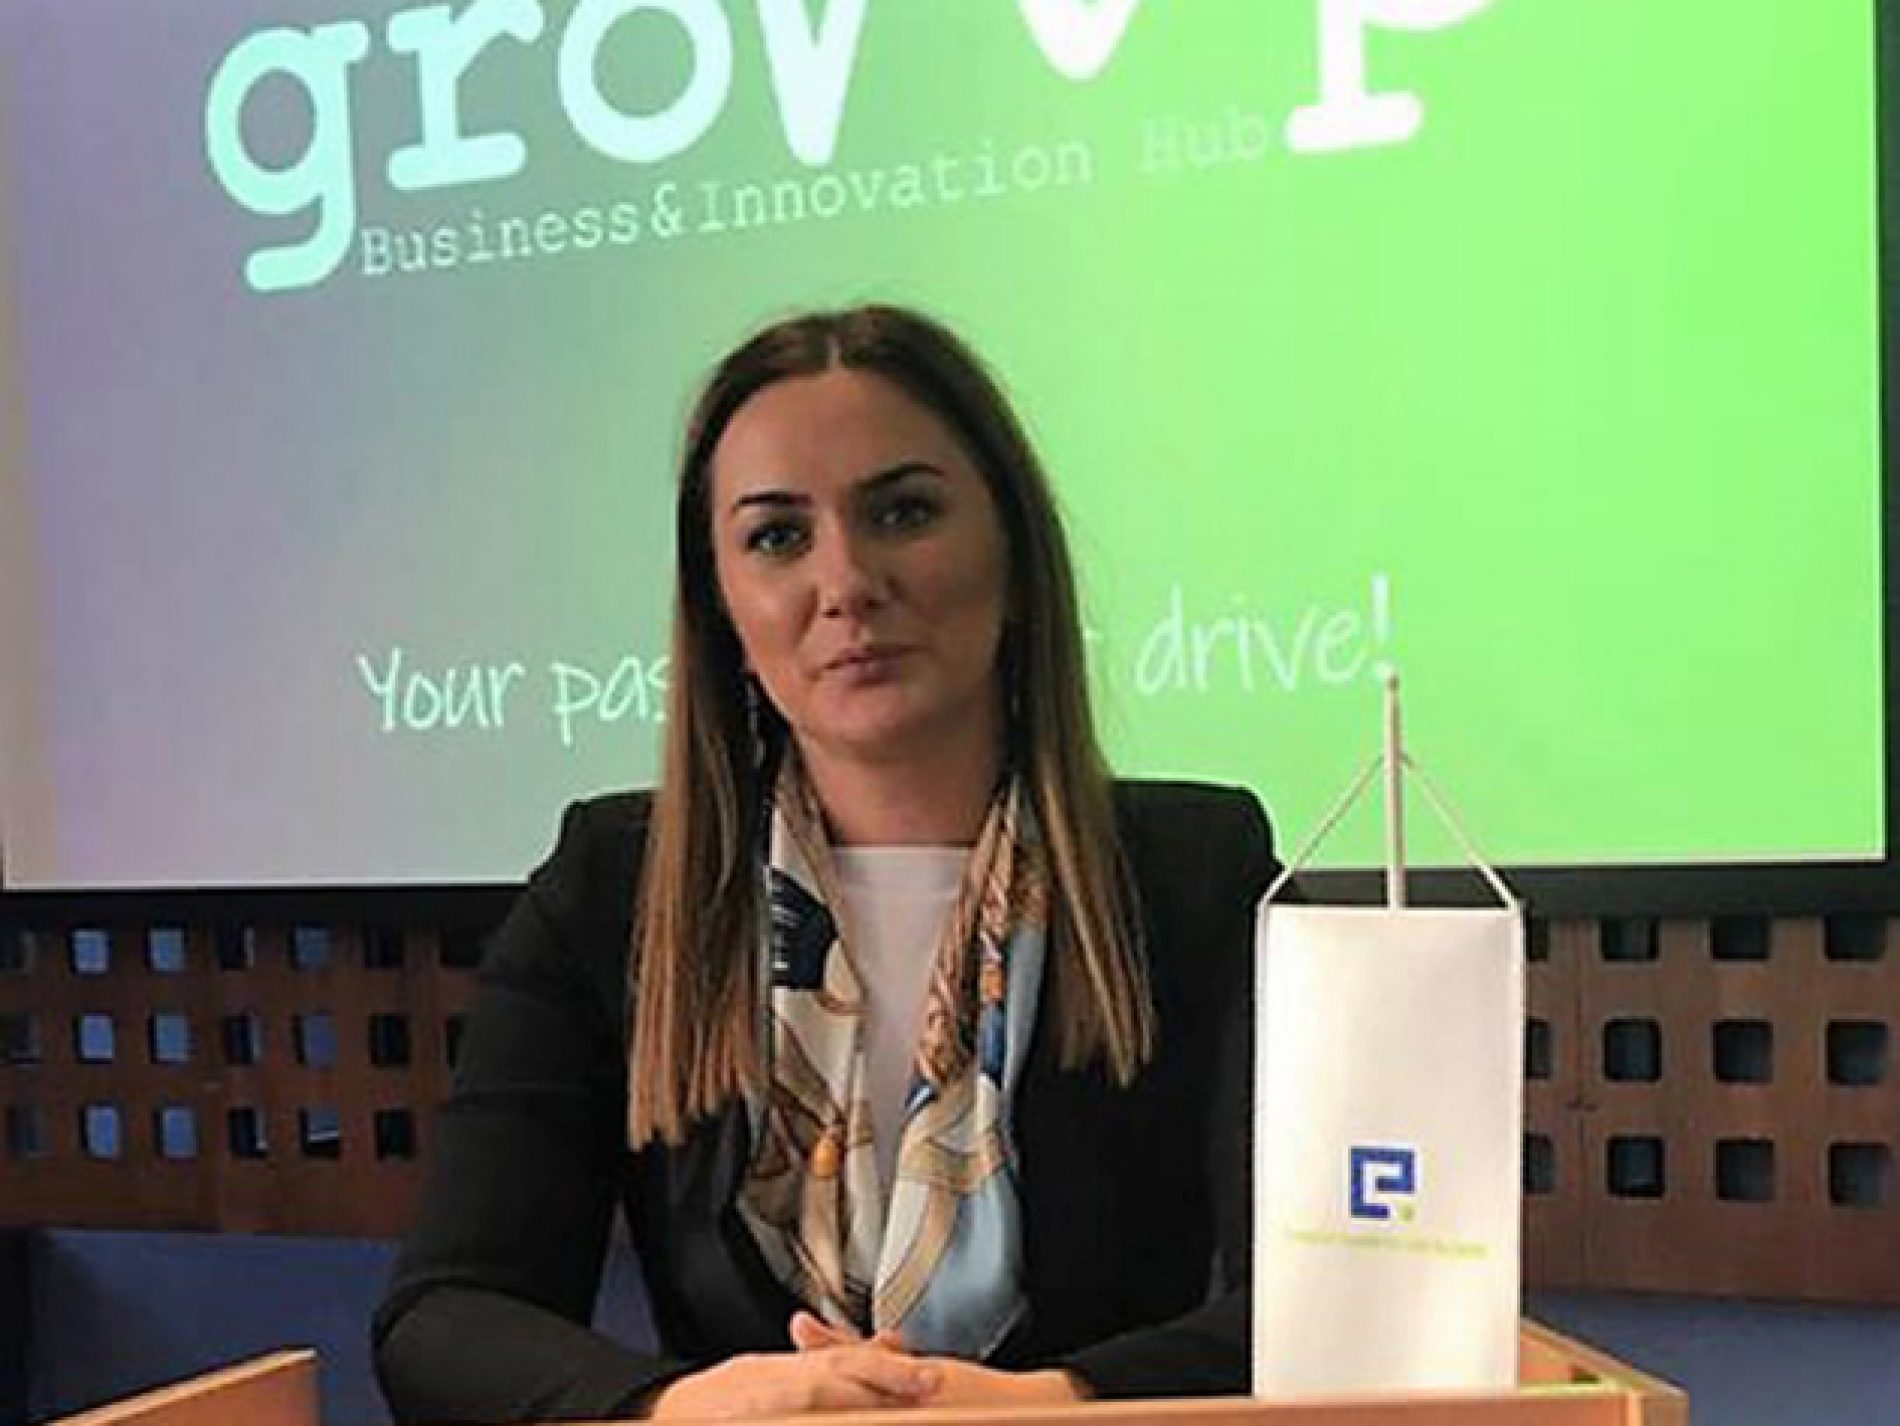 Većina startap kompanija rezultat studentskih projekata – Ekonomski fakultet u Sarajevu generiše ideje kroz inkubator GrowUp